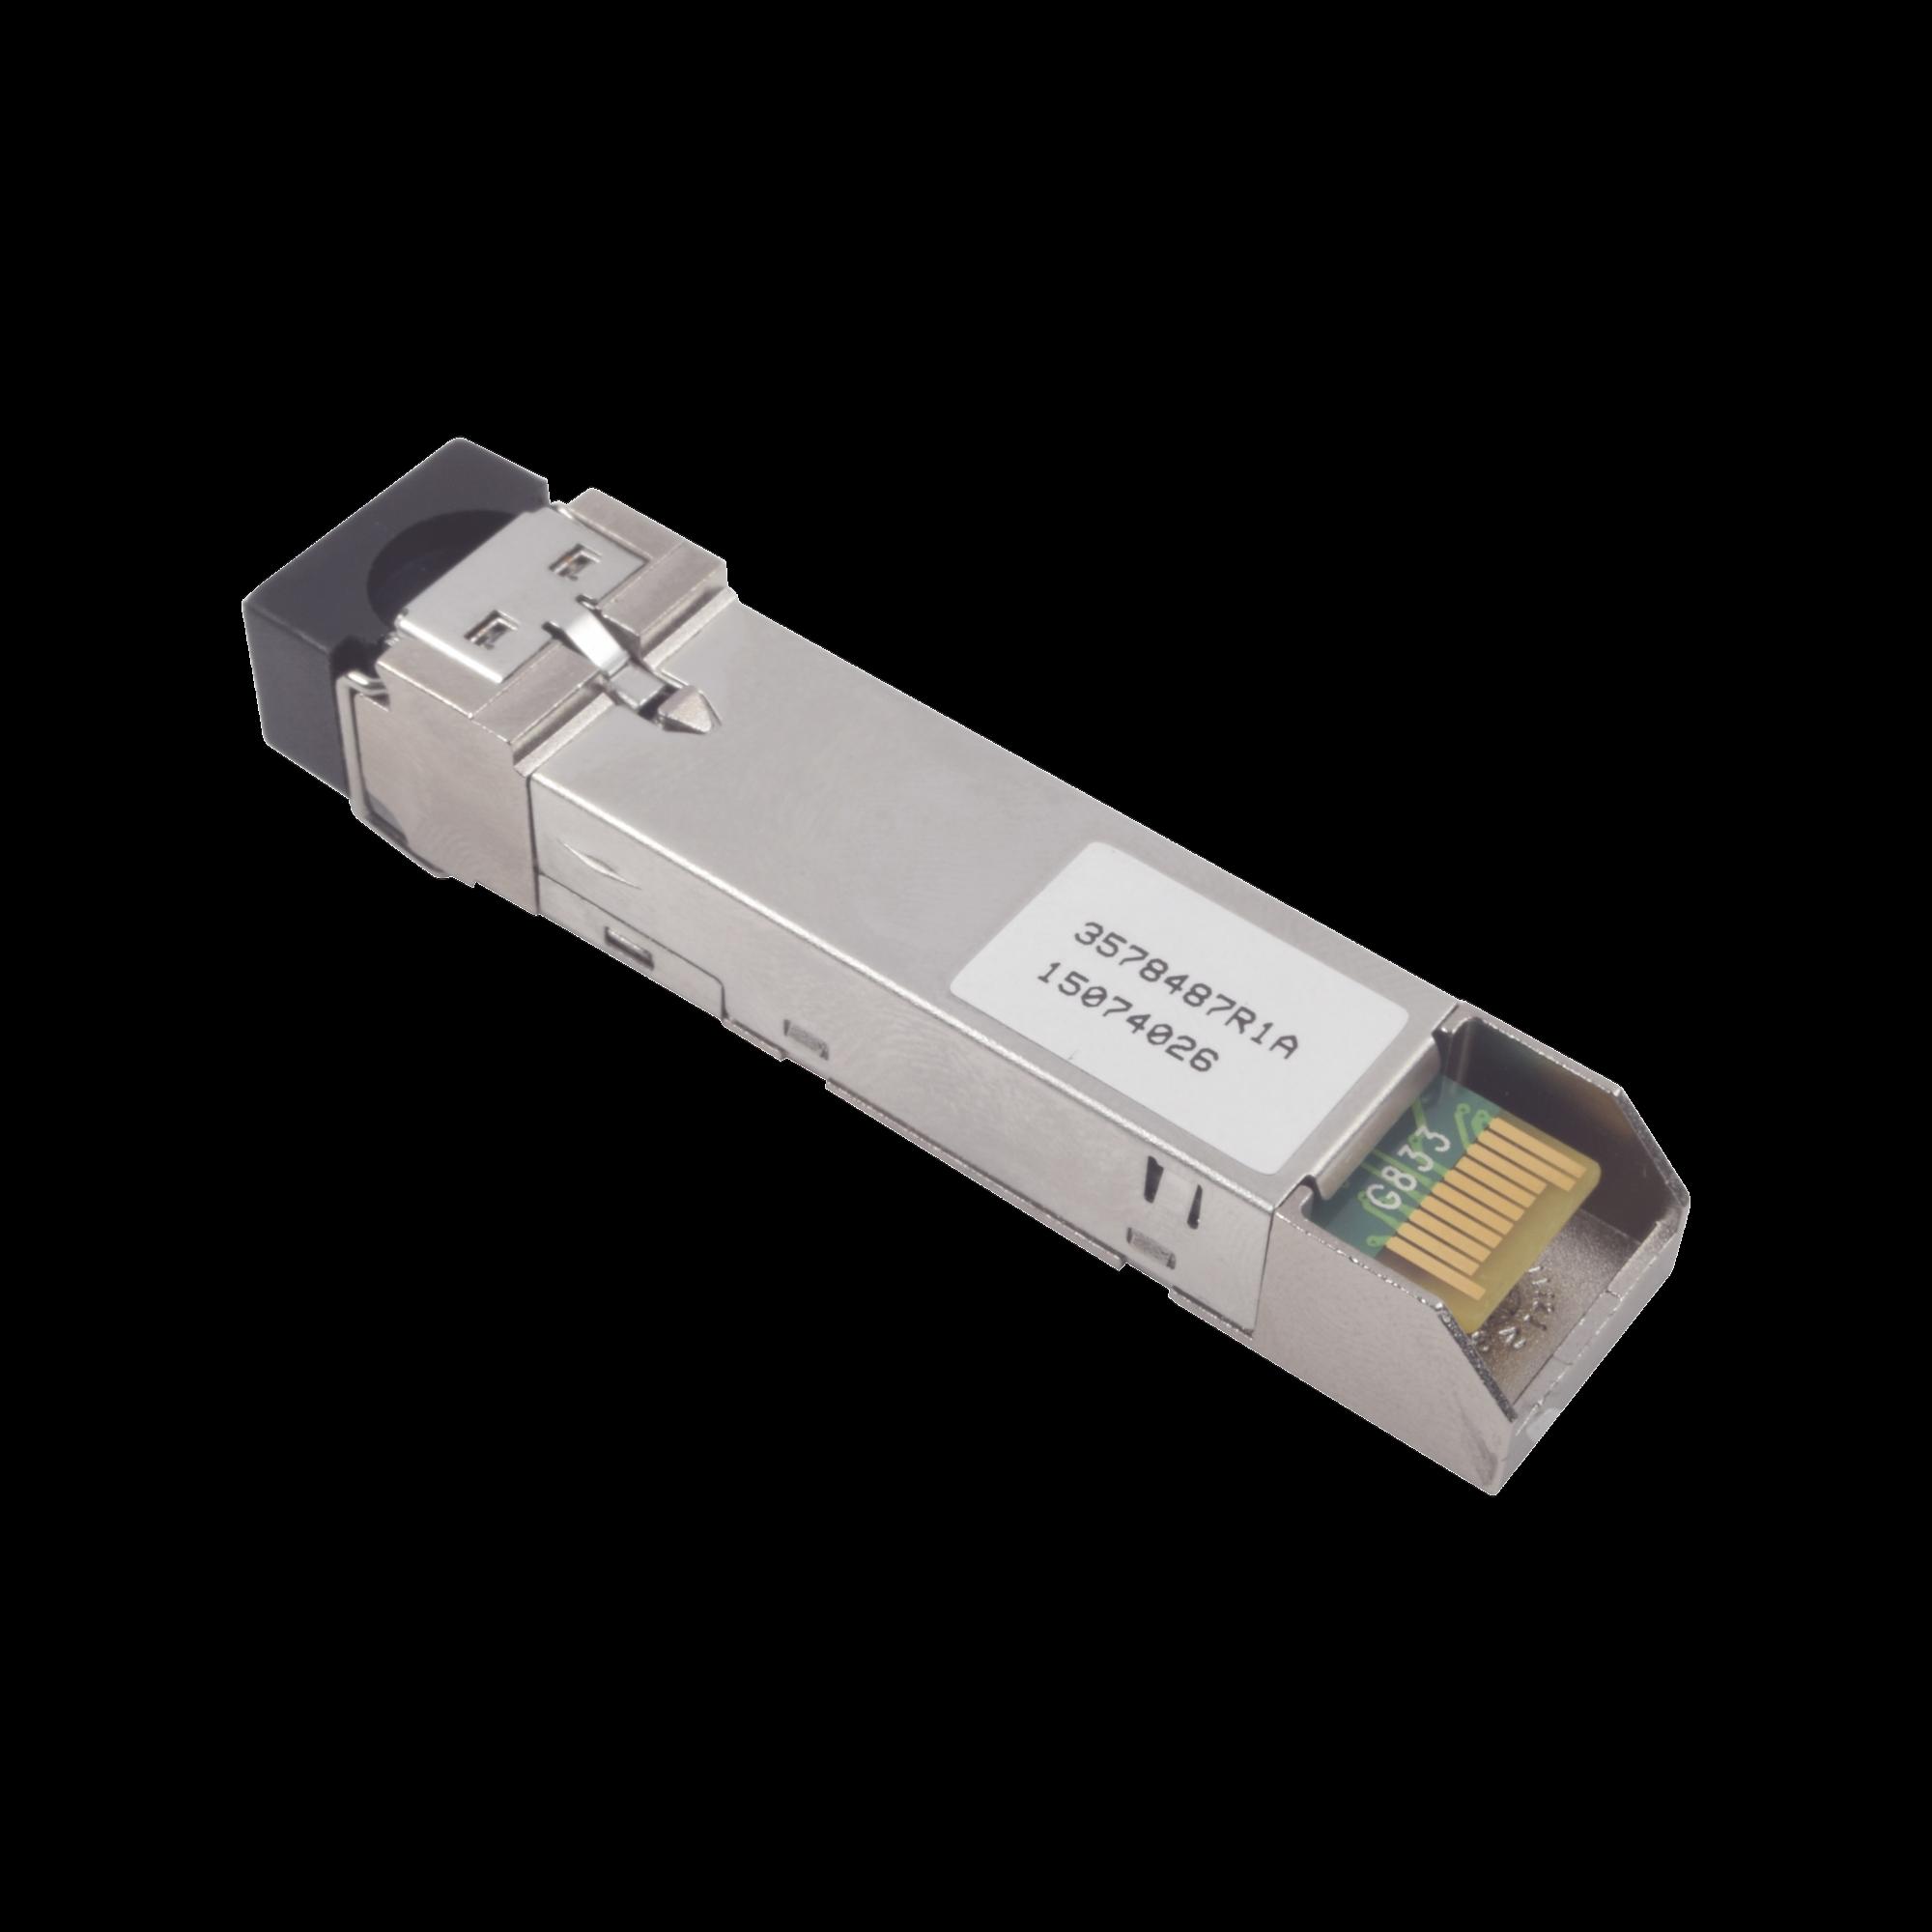 Módulo Transceptor Uplink SFP Monomodo, 1.25 Gbit/s, 10 km, para OLTs serie AN5000